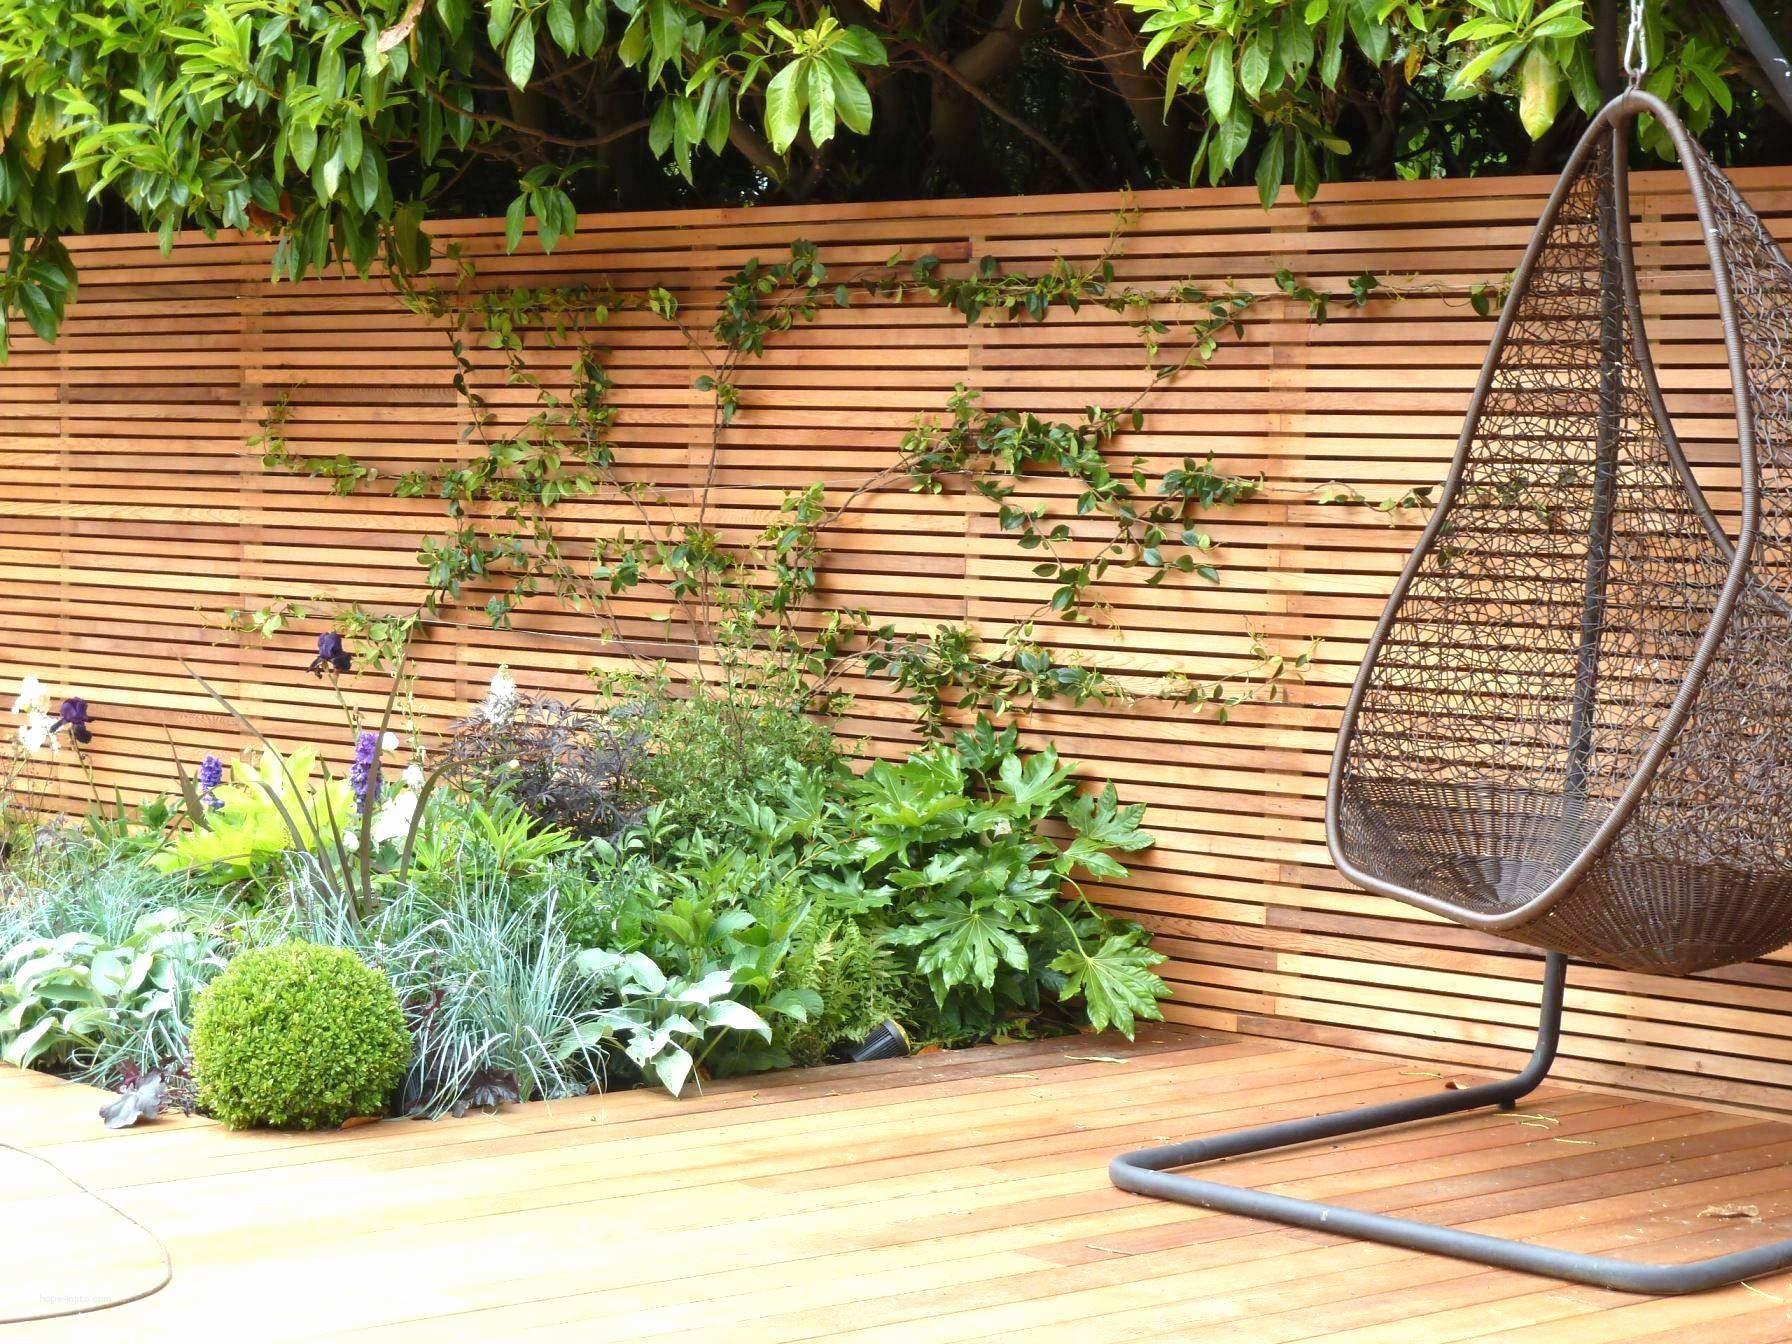 garten terrasse ideen genial 71 luxus garten sichtschutz ideen of garten terrasse ideen